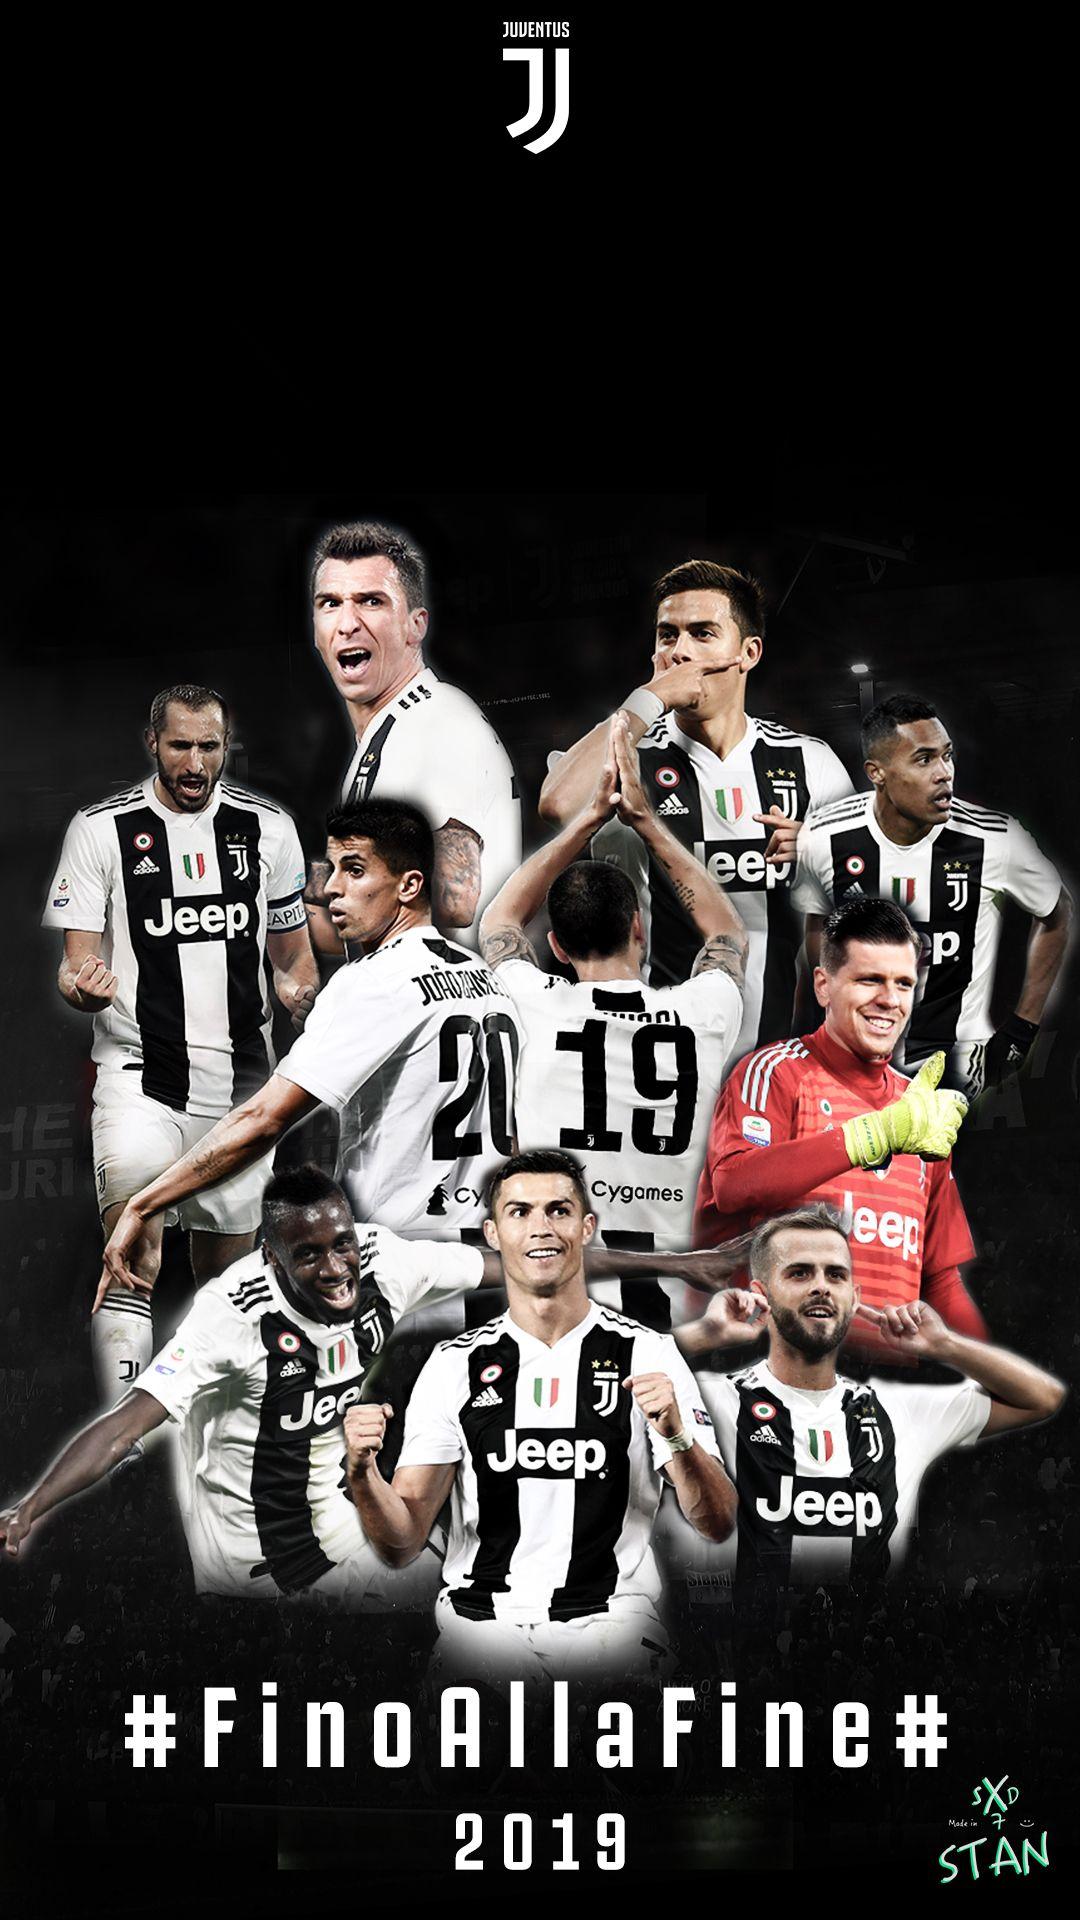 Juventus Football Club Players 2019 Happy New Year Football